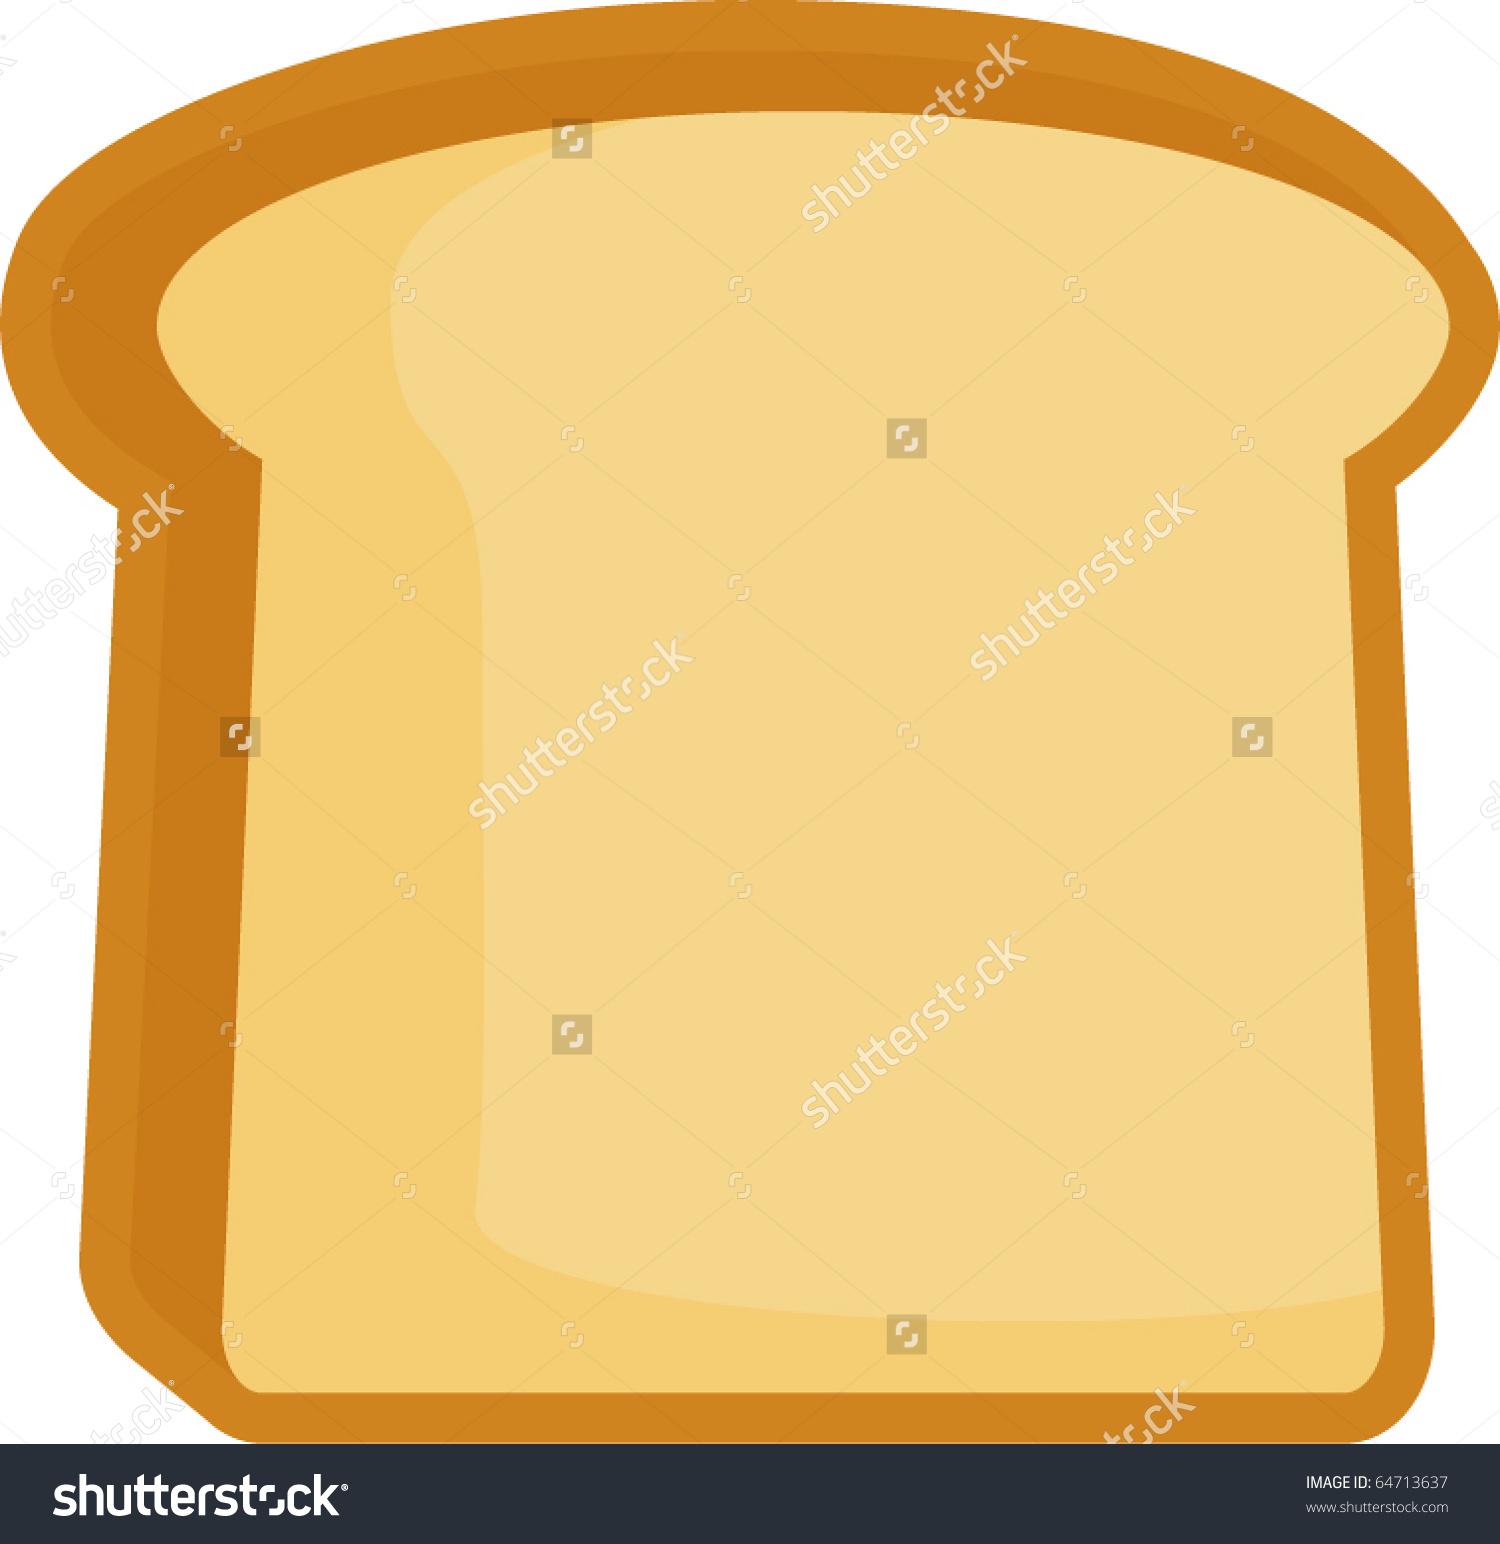 Toast clipart slice bread Slice Slice  bread Bread